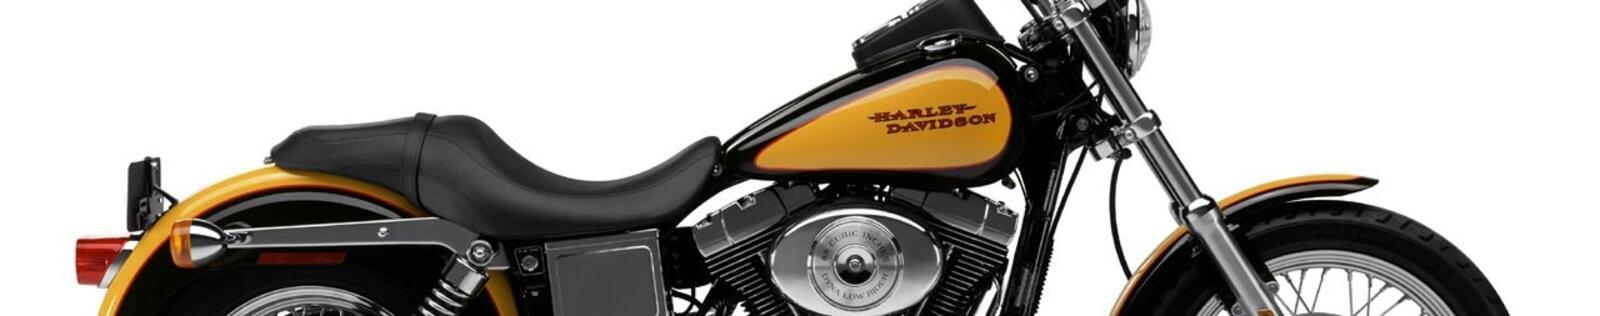 Offerta Harley Reunion Rimini